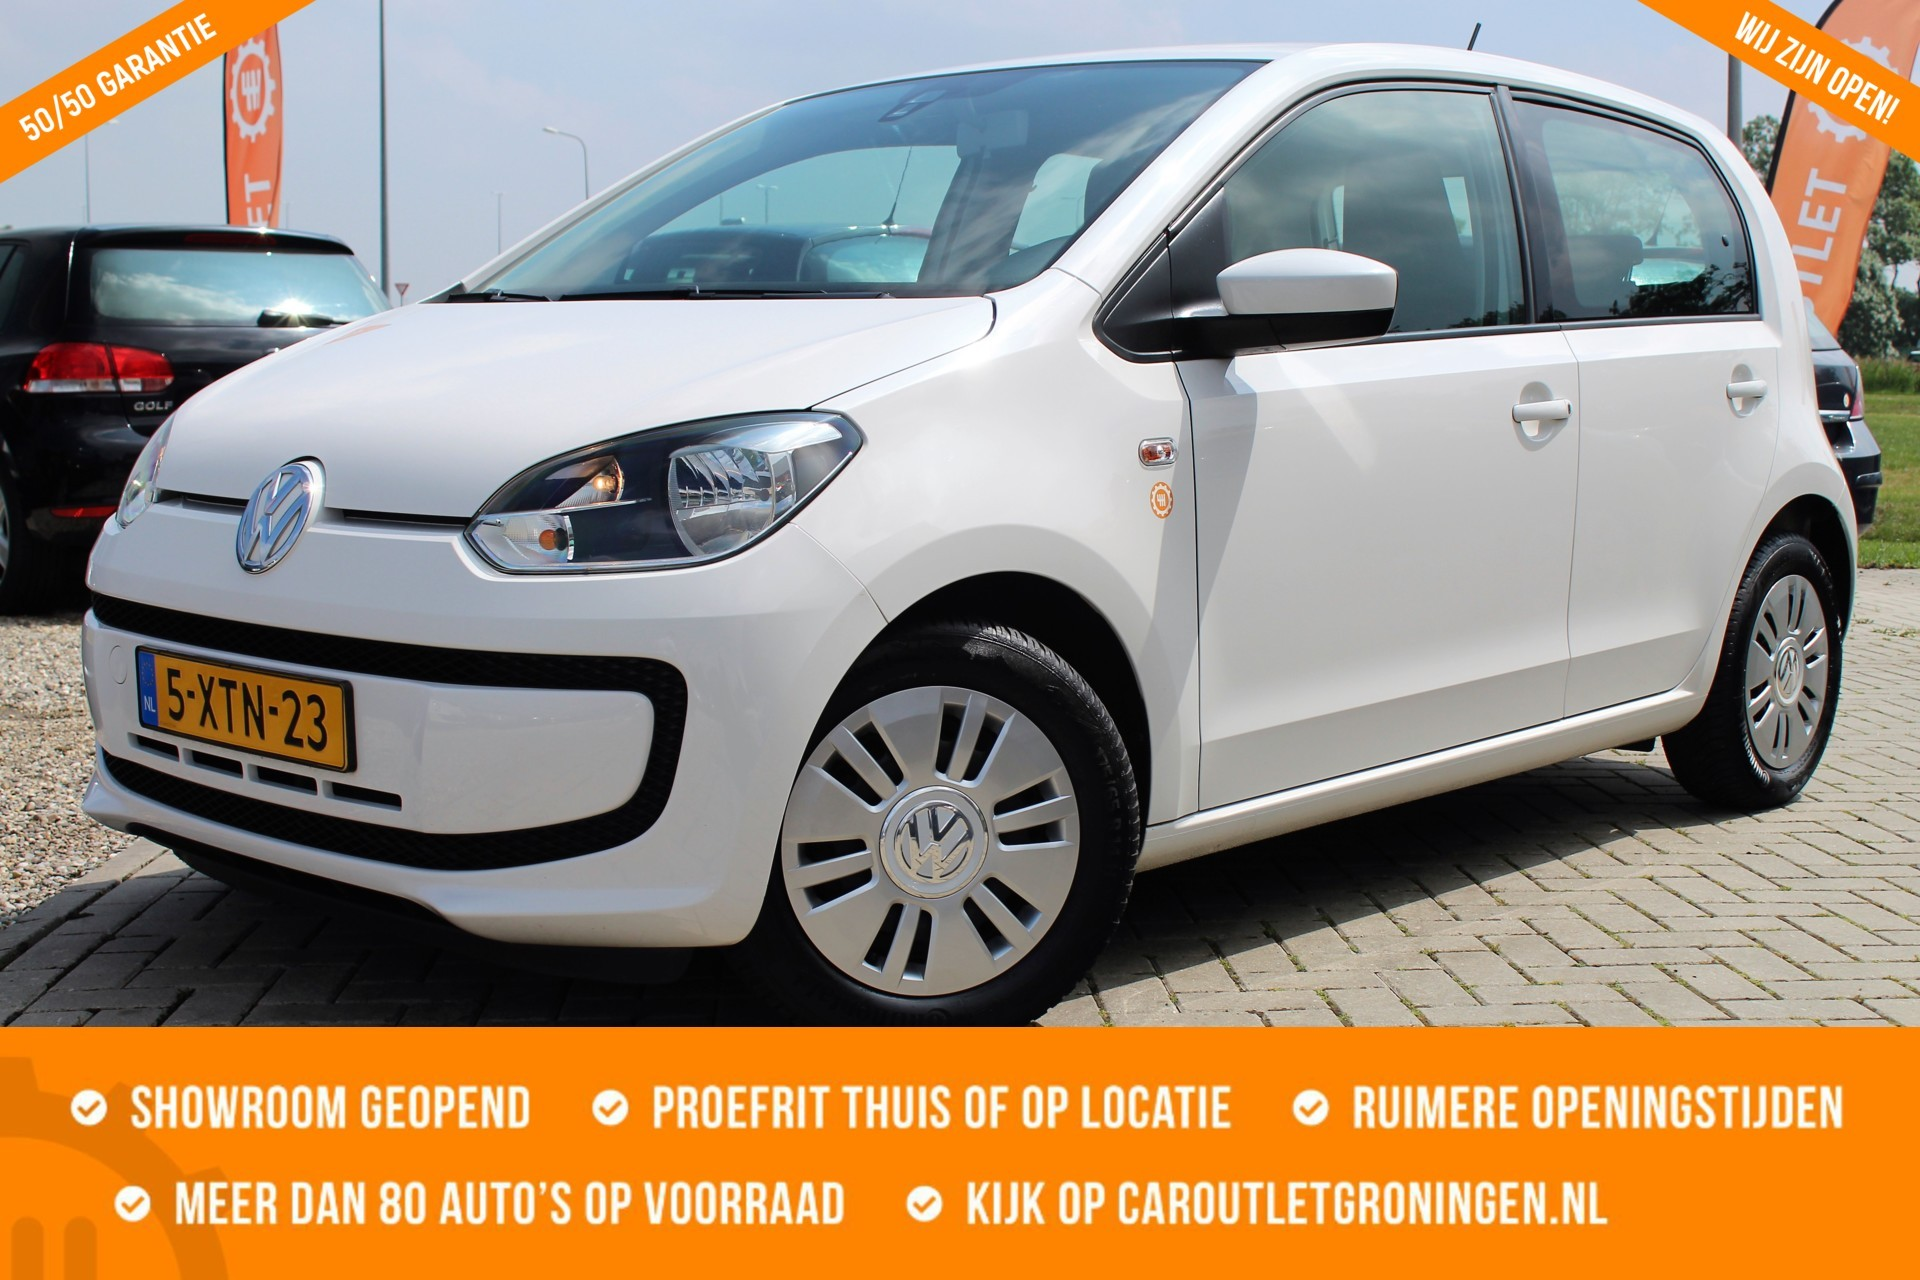 Caroutlet Groningen - Volkswagen Up! 1.0 move up! BlueMotion   5 DEURS   AIRCO  